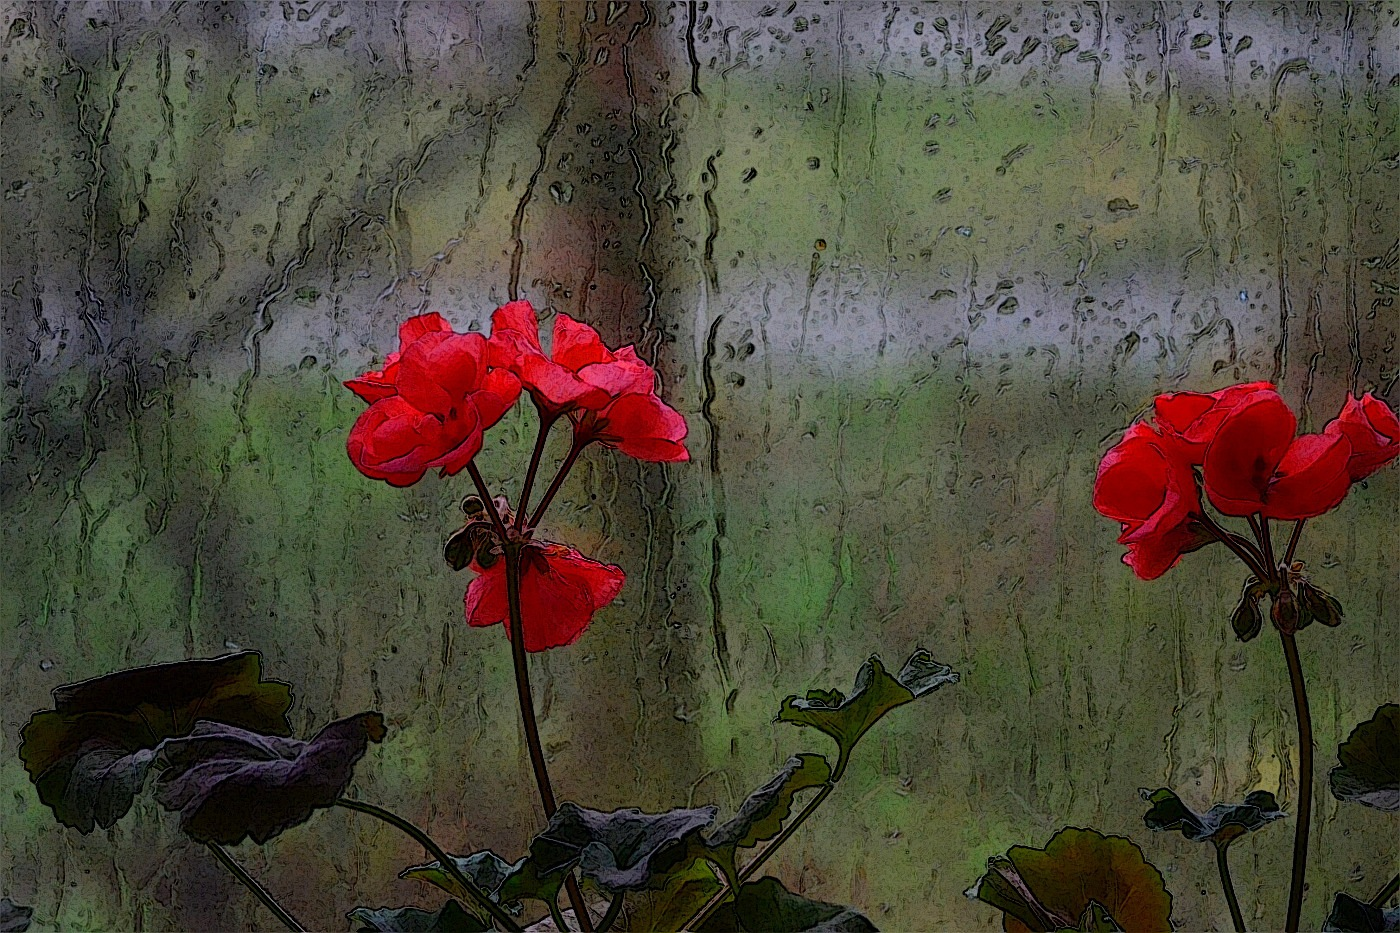 Rain by David Sjöstrand